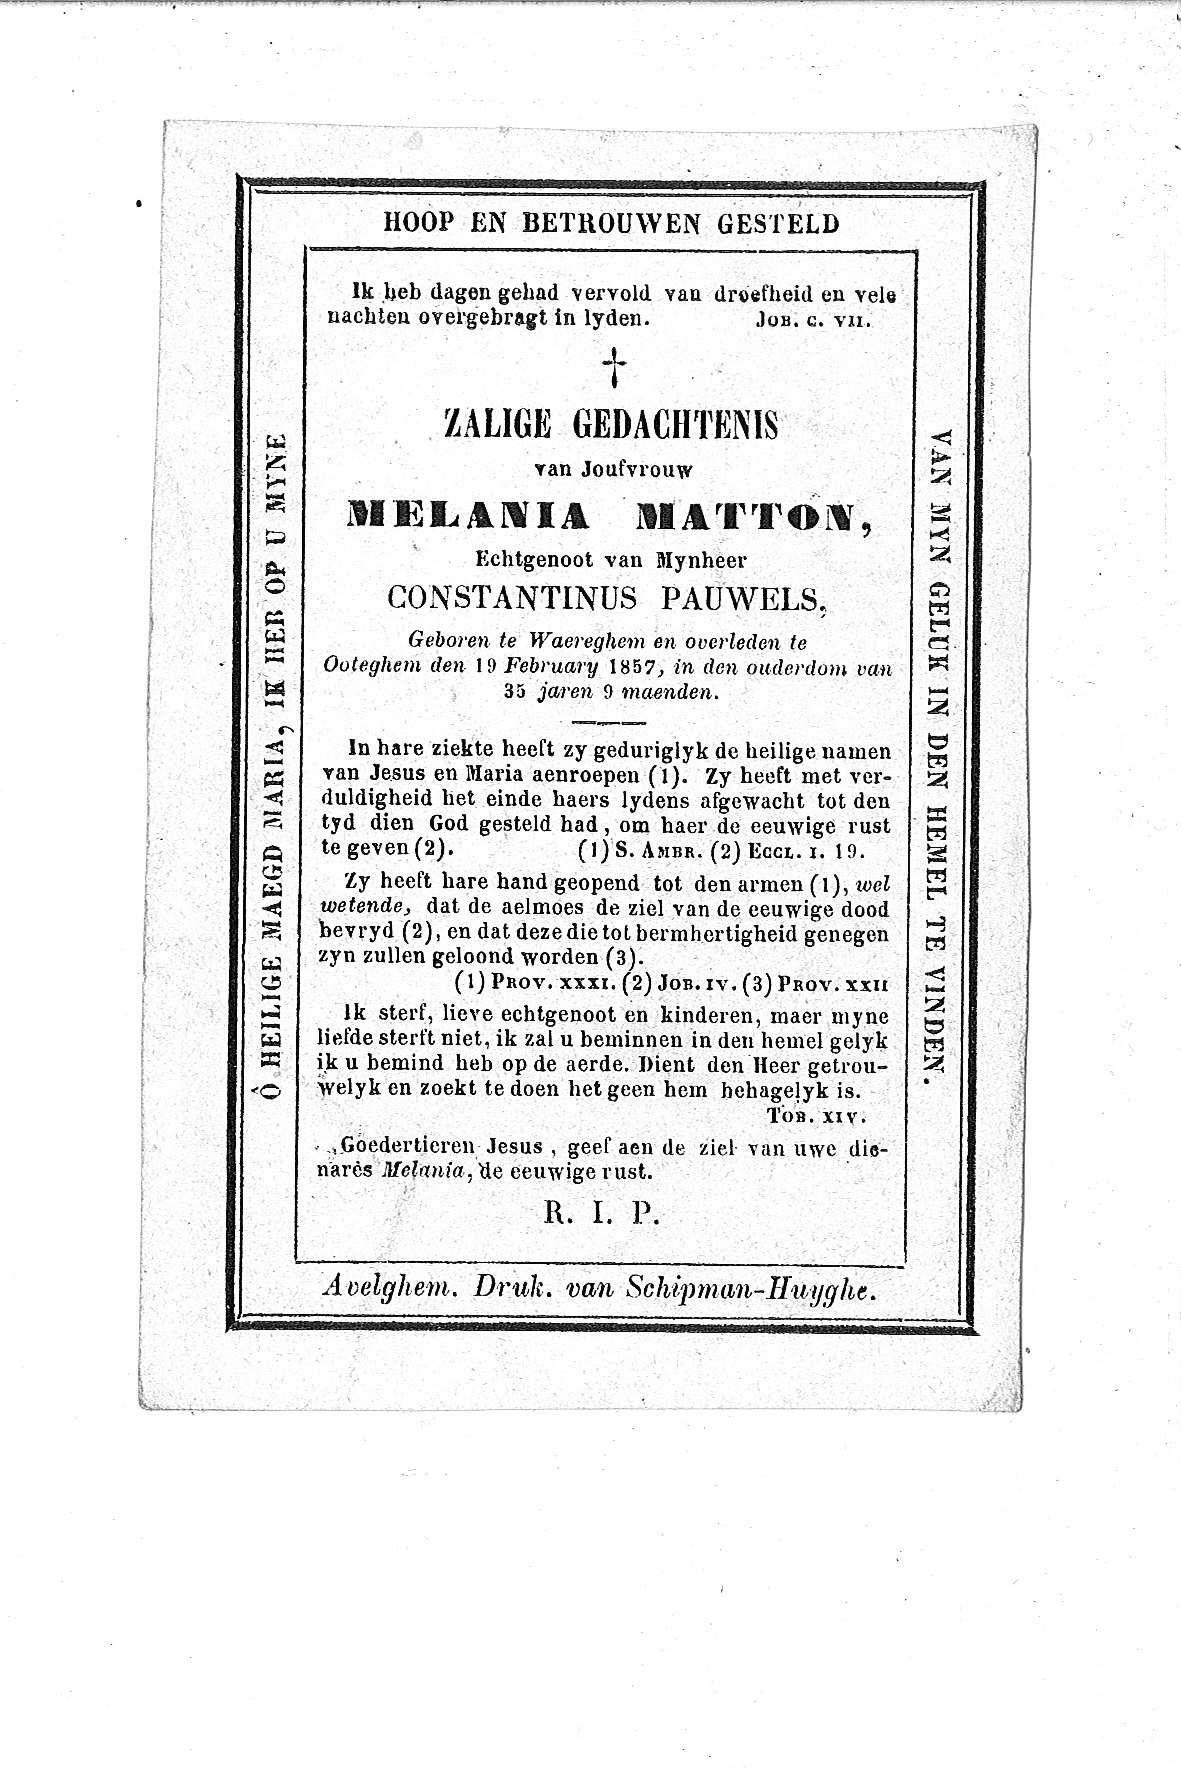 Melania(1887)20100203094749_00005.jpg